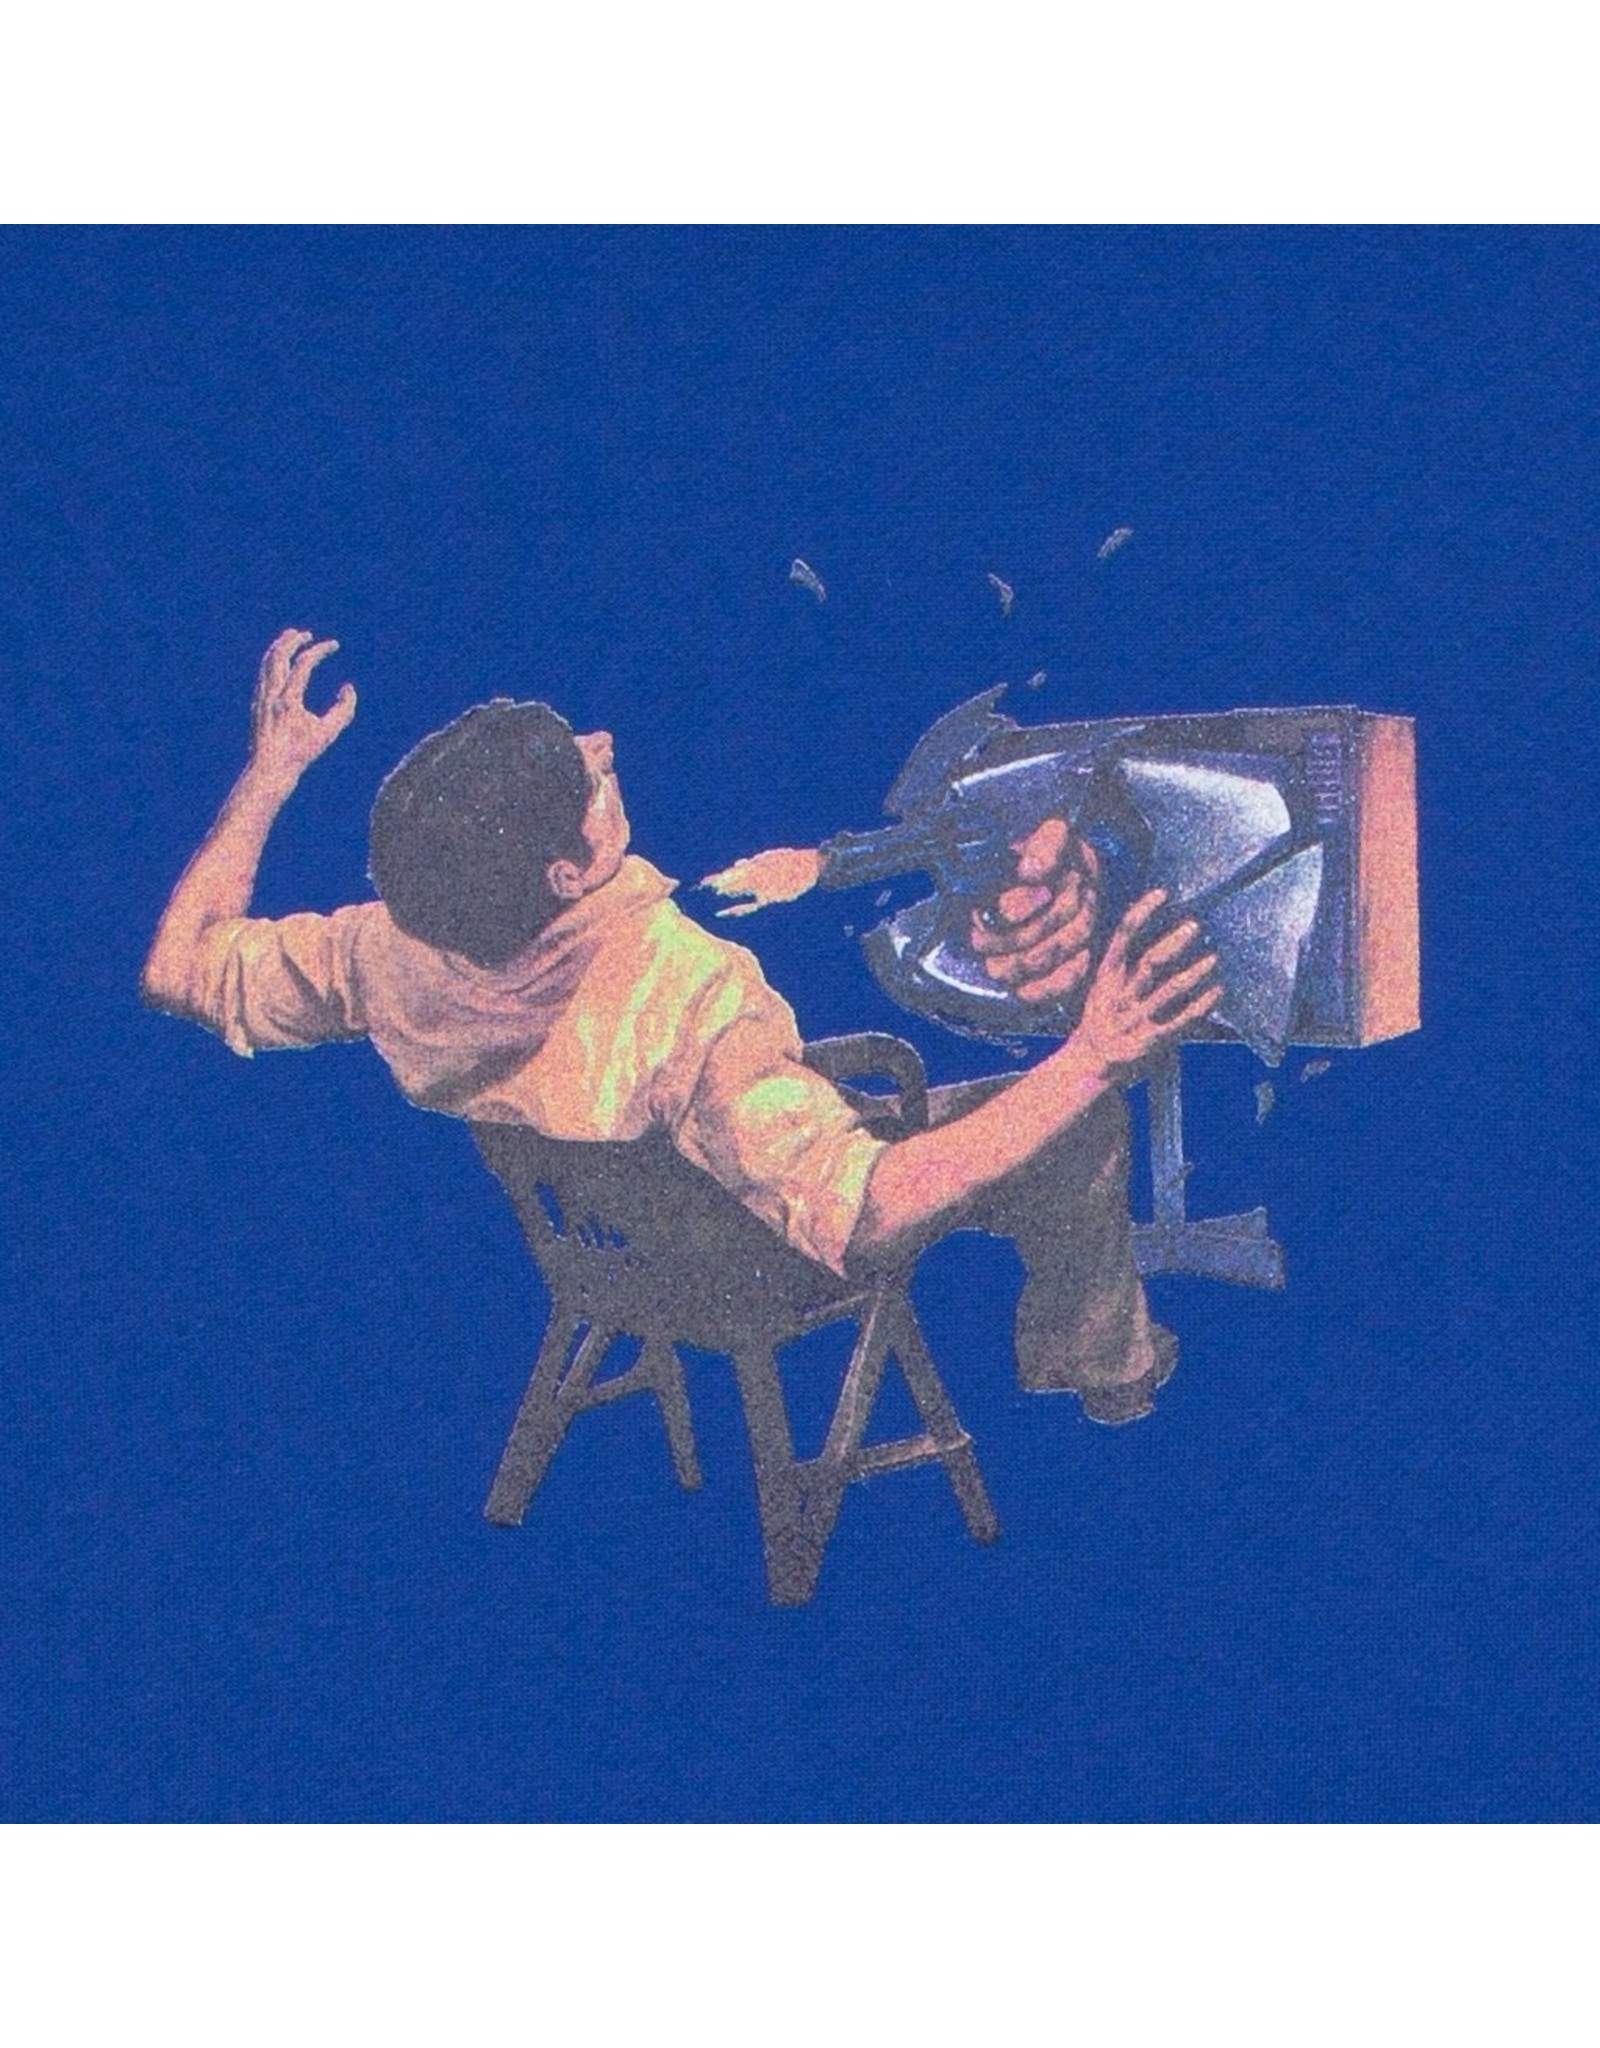 HOCKEY HOCKEY - ULTRAVIOLENCE HOODIE - BLUE -